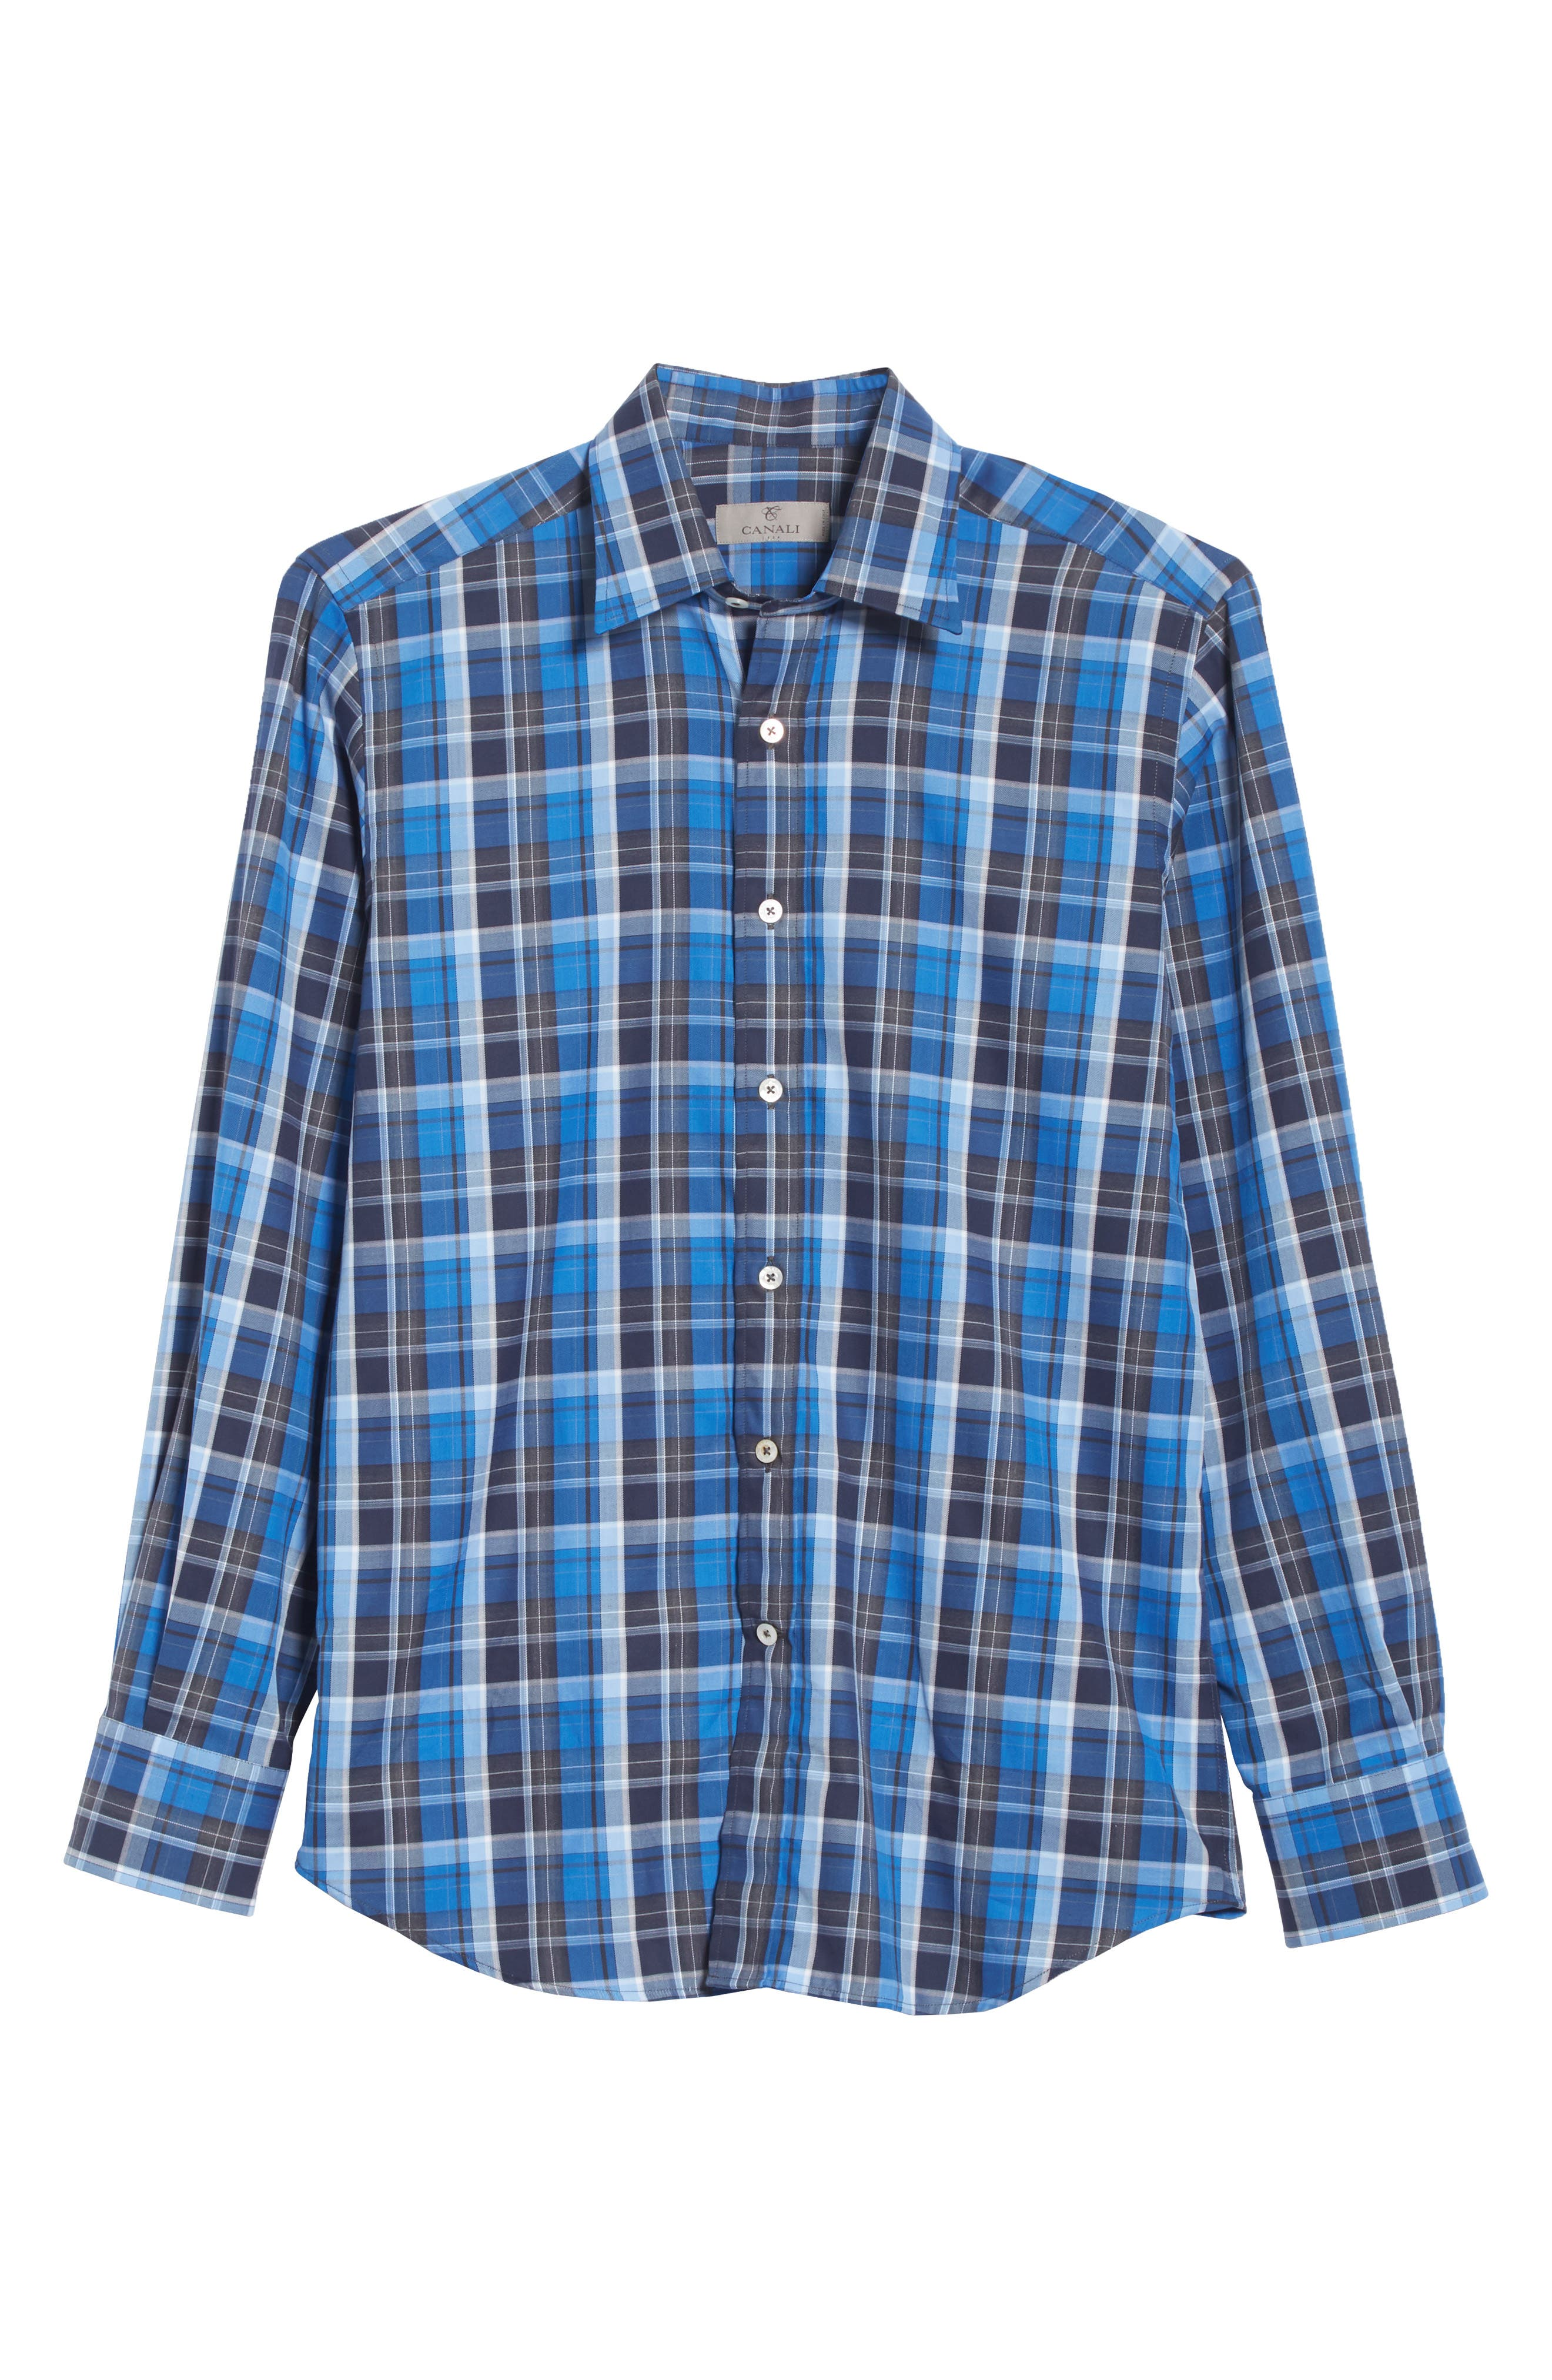 Regular Fit Plaid Sport Shirt,                             Alternate thumbnail 6, color,                             Blue